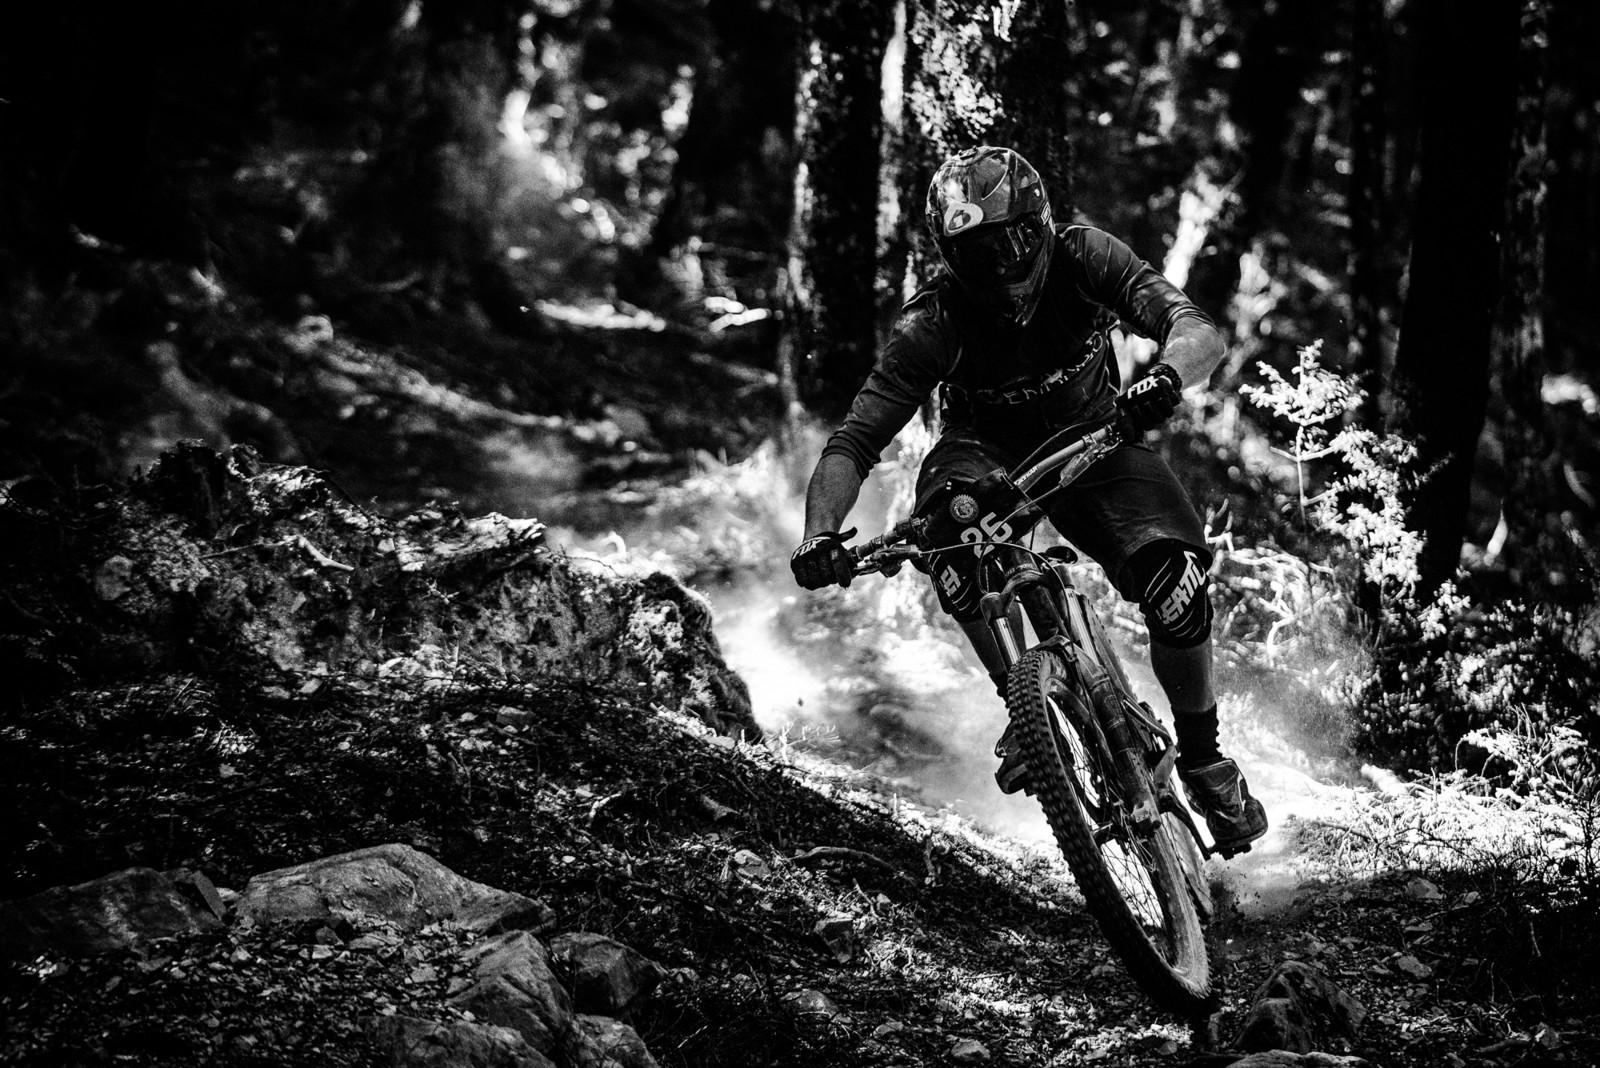 Andre Jaworski - 2019 Dodzy Memorial Enduro - Mountain Biking Pictures - Vital MTB